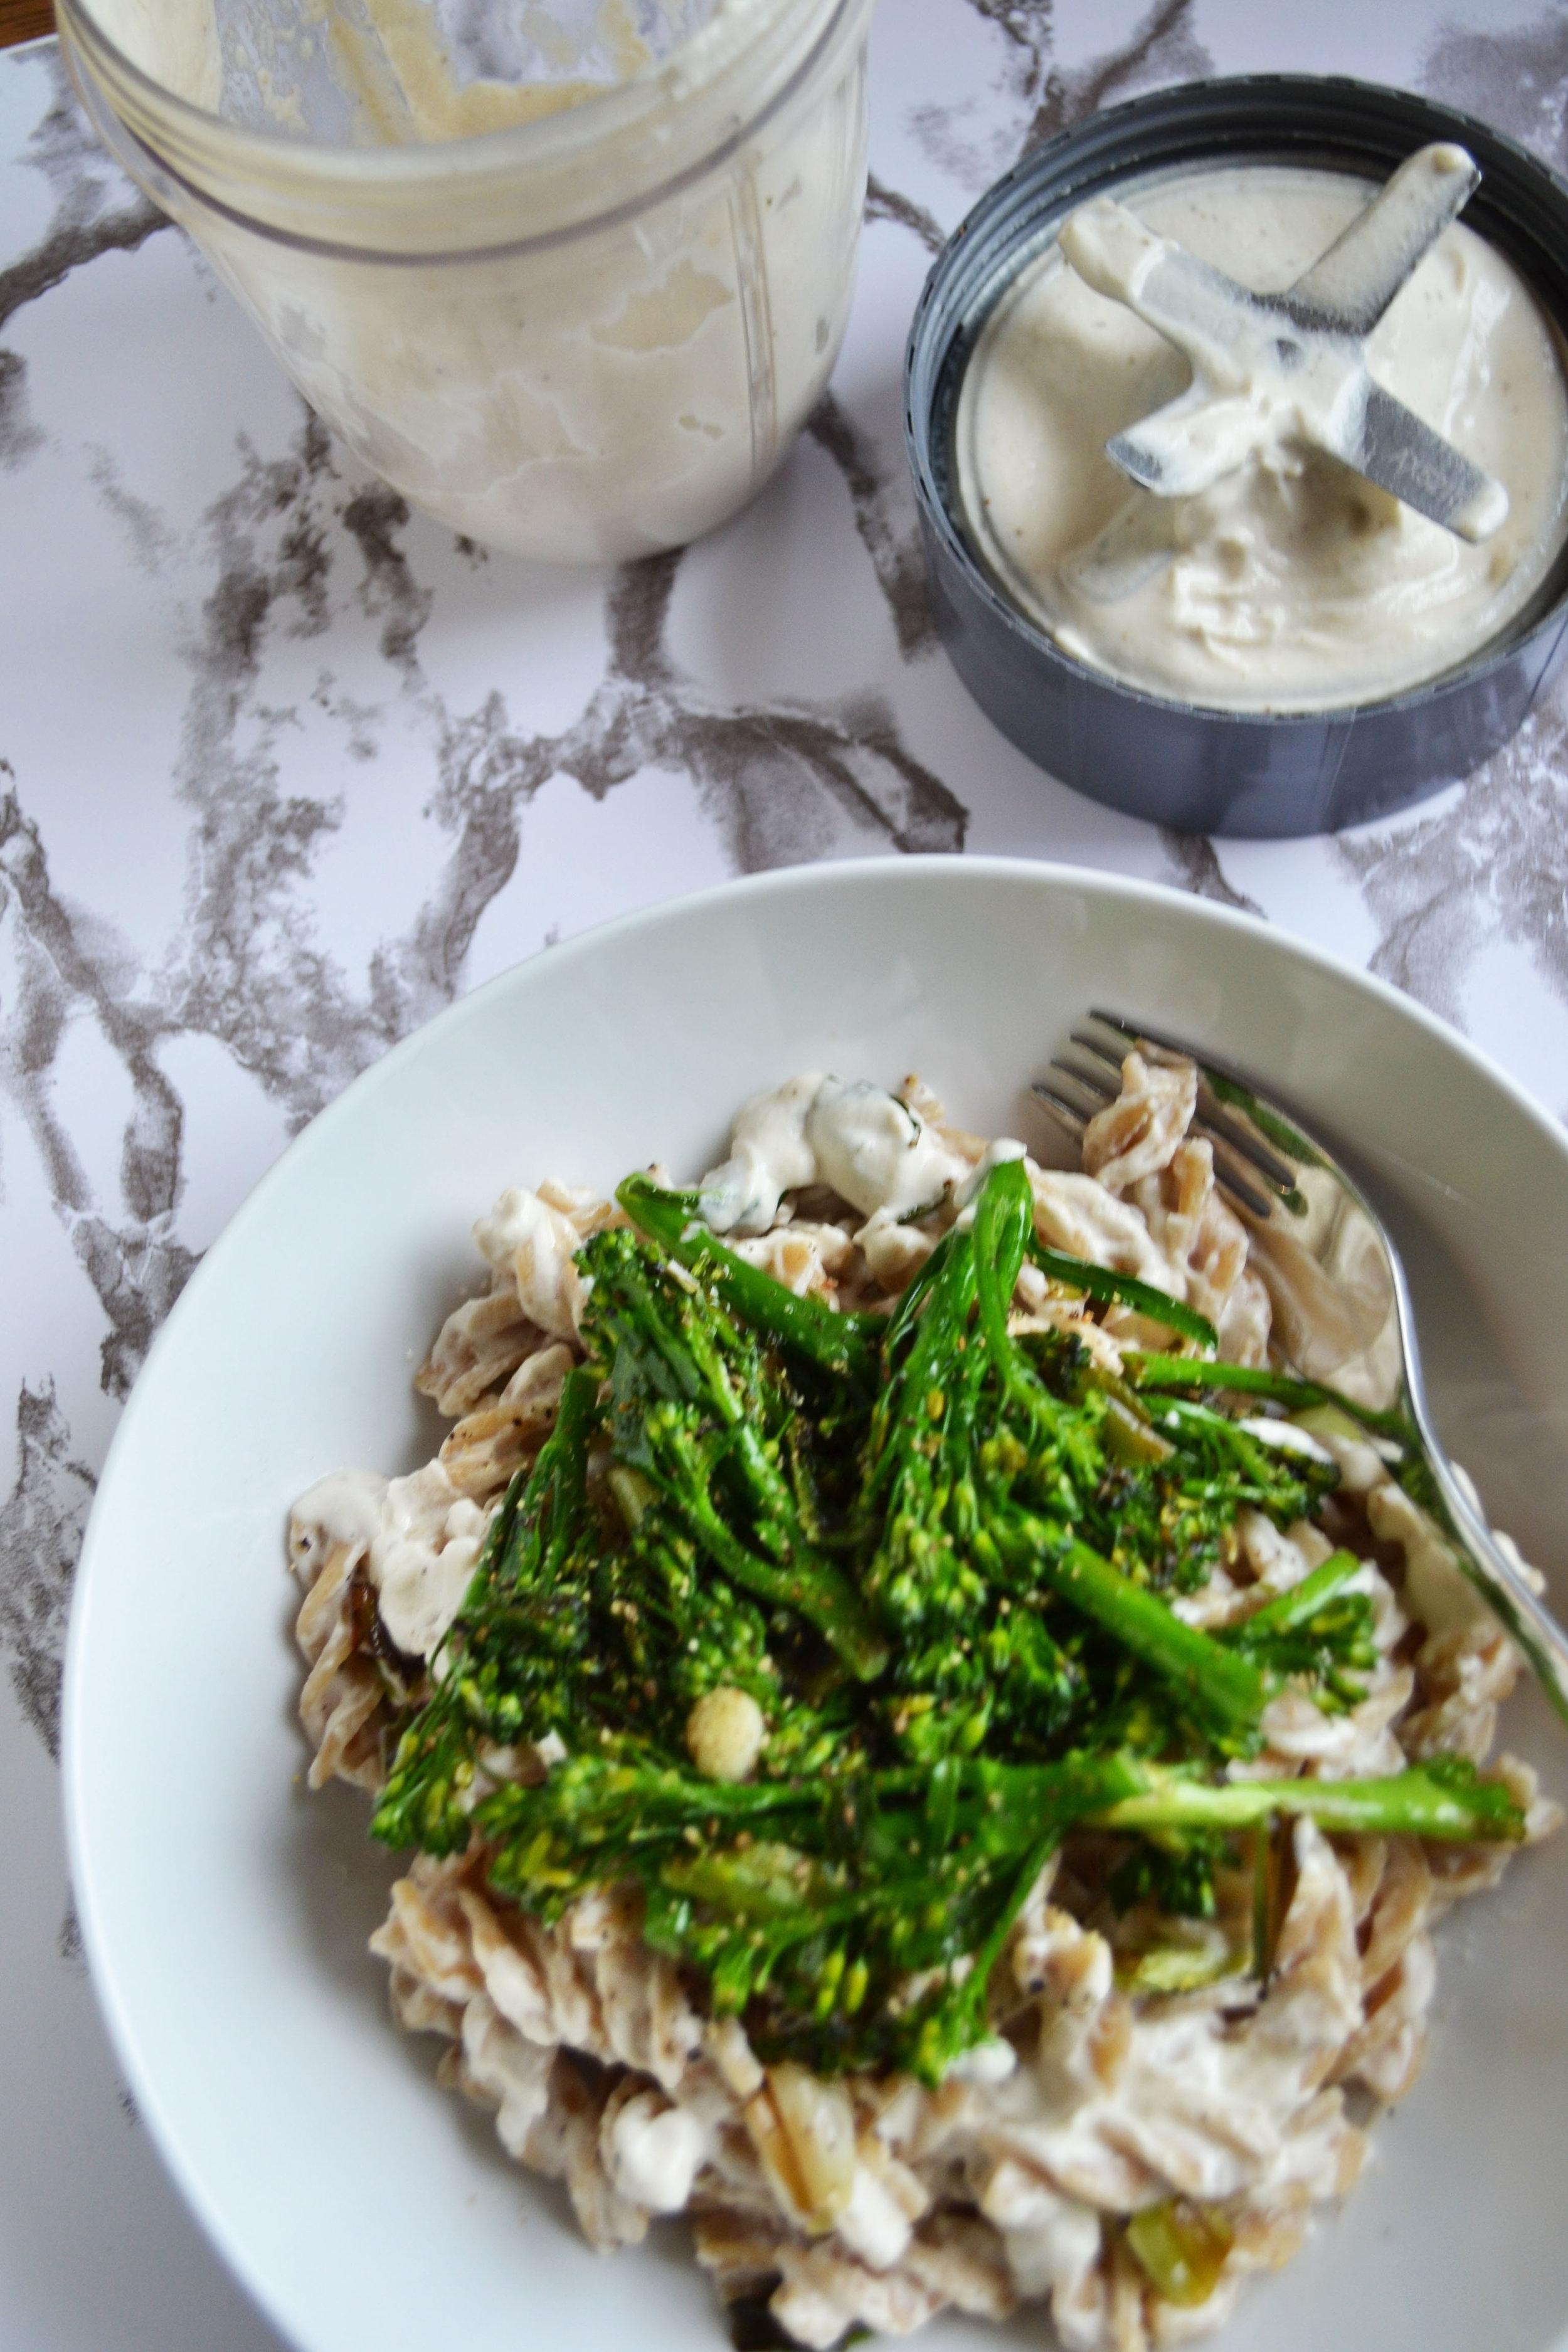 Creamy cashew pasta | The Flourishing Pantry